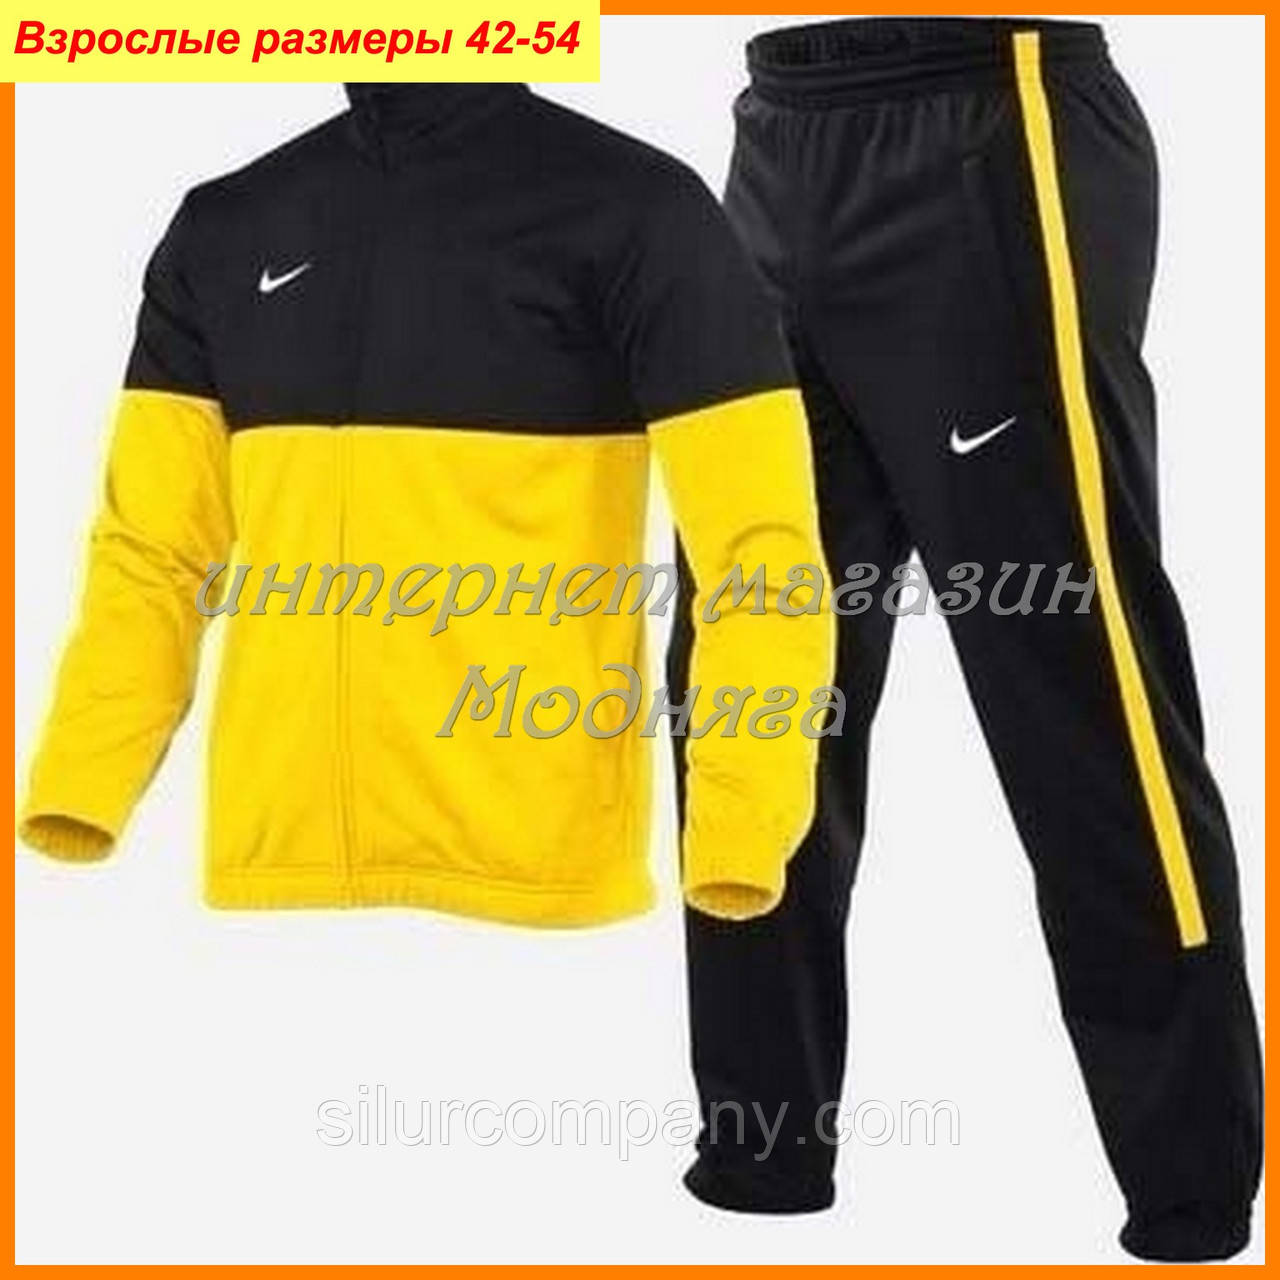 b9c542c4aa84 Спортивный костюм найк   оригинальная модель nike  продажа, цена в ...